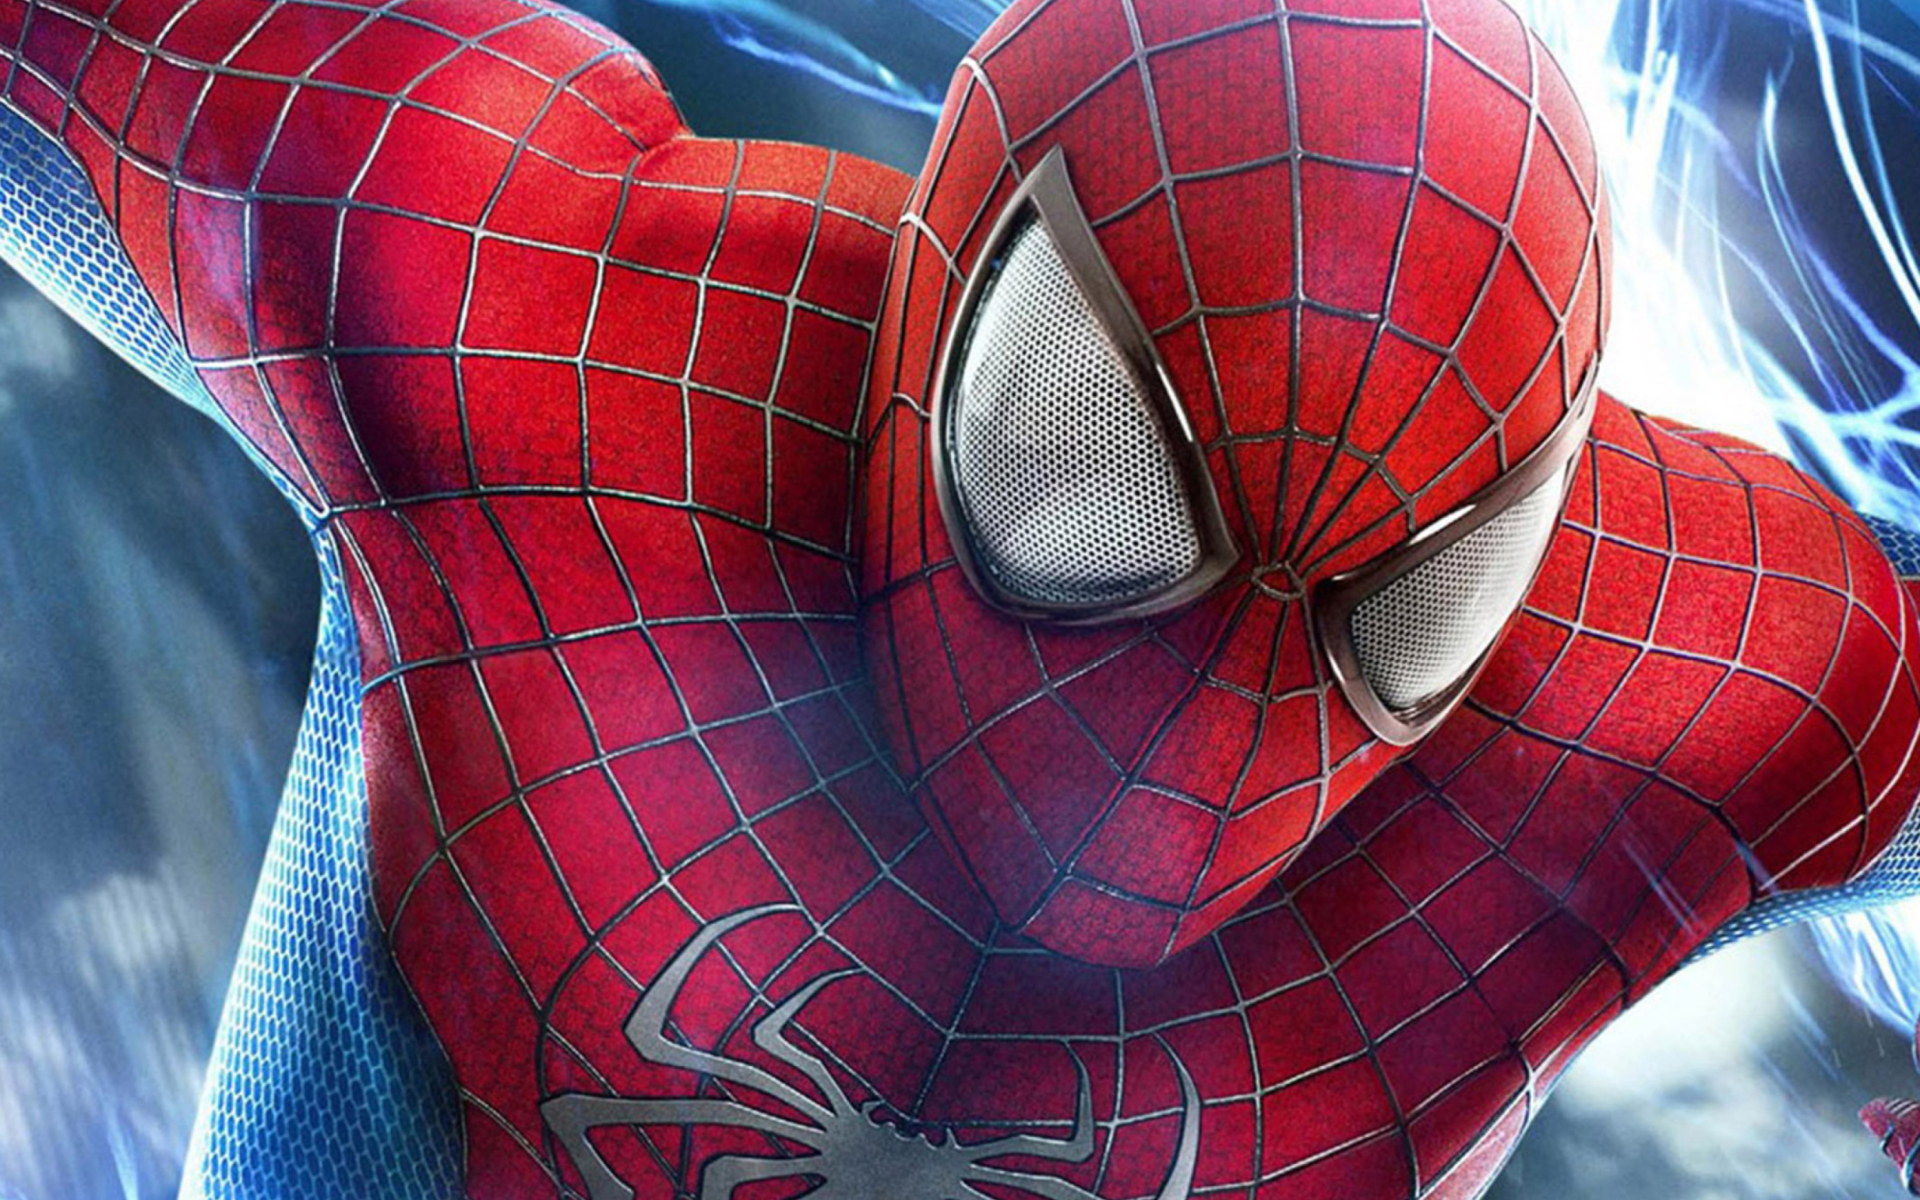 Spiderman fondos de pantalla gratis para widescreen for Fondos de spiderman